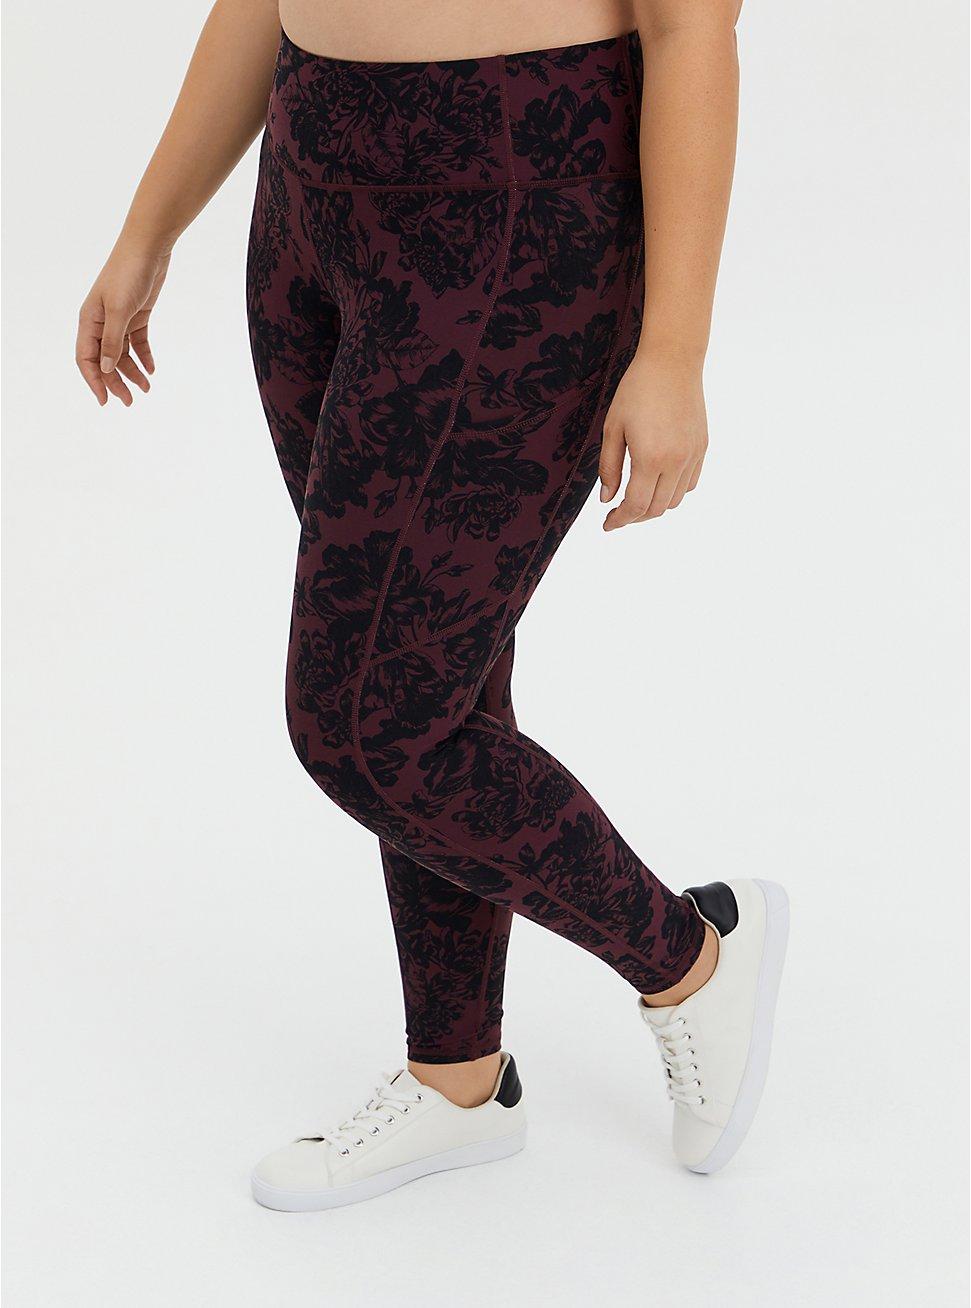 Red & Black Floral Wicking Full Length Active Legging, FLORALS-RED, hi-res